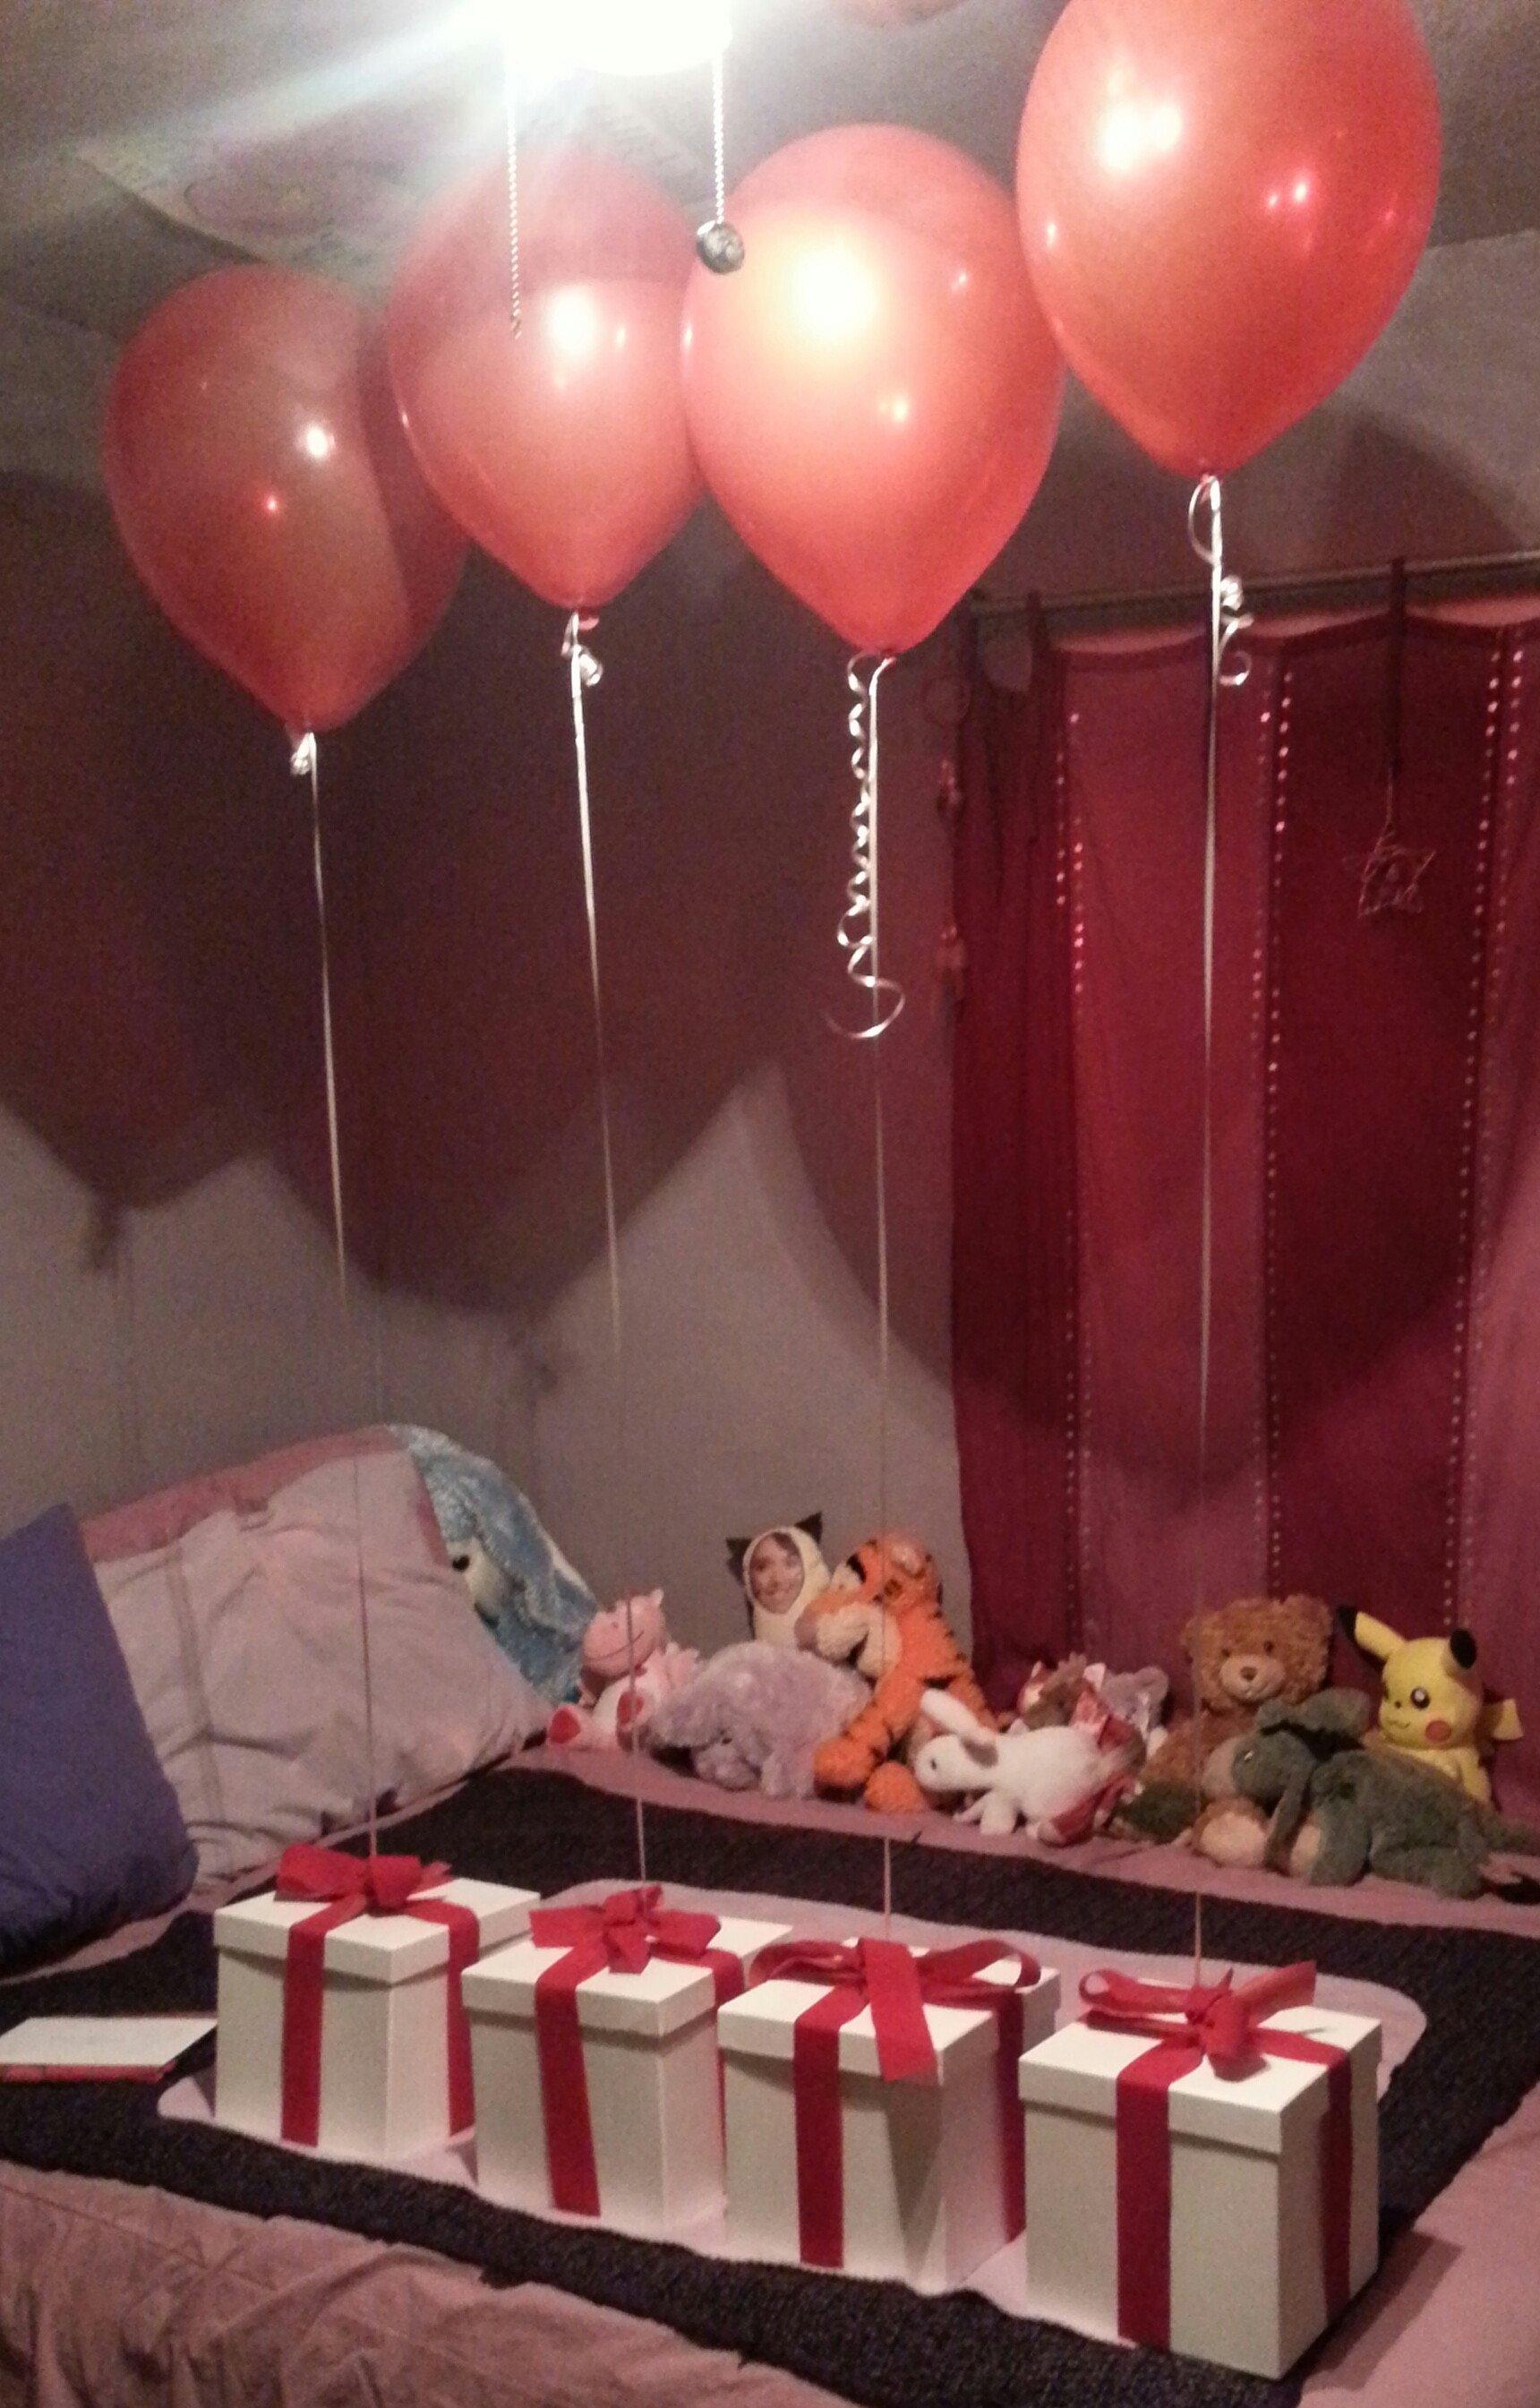 10 Most Popular Romantic Ideas For His Birthday gift ideas for boyfriend great birthday gift ideas for my boyfriend 2